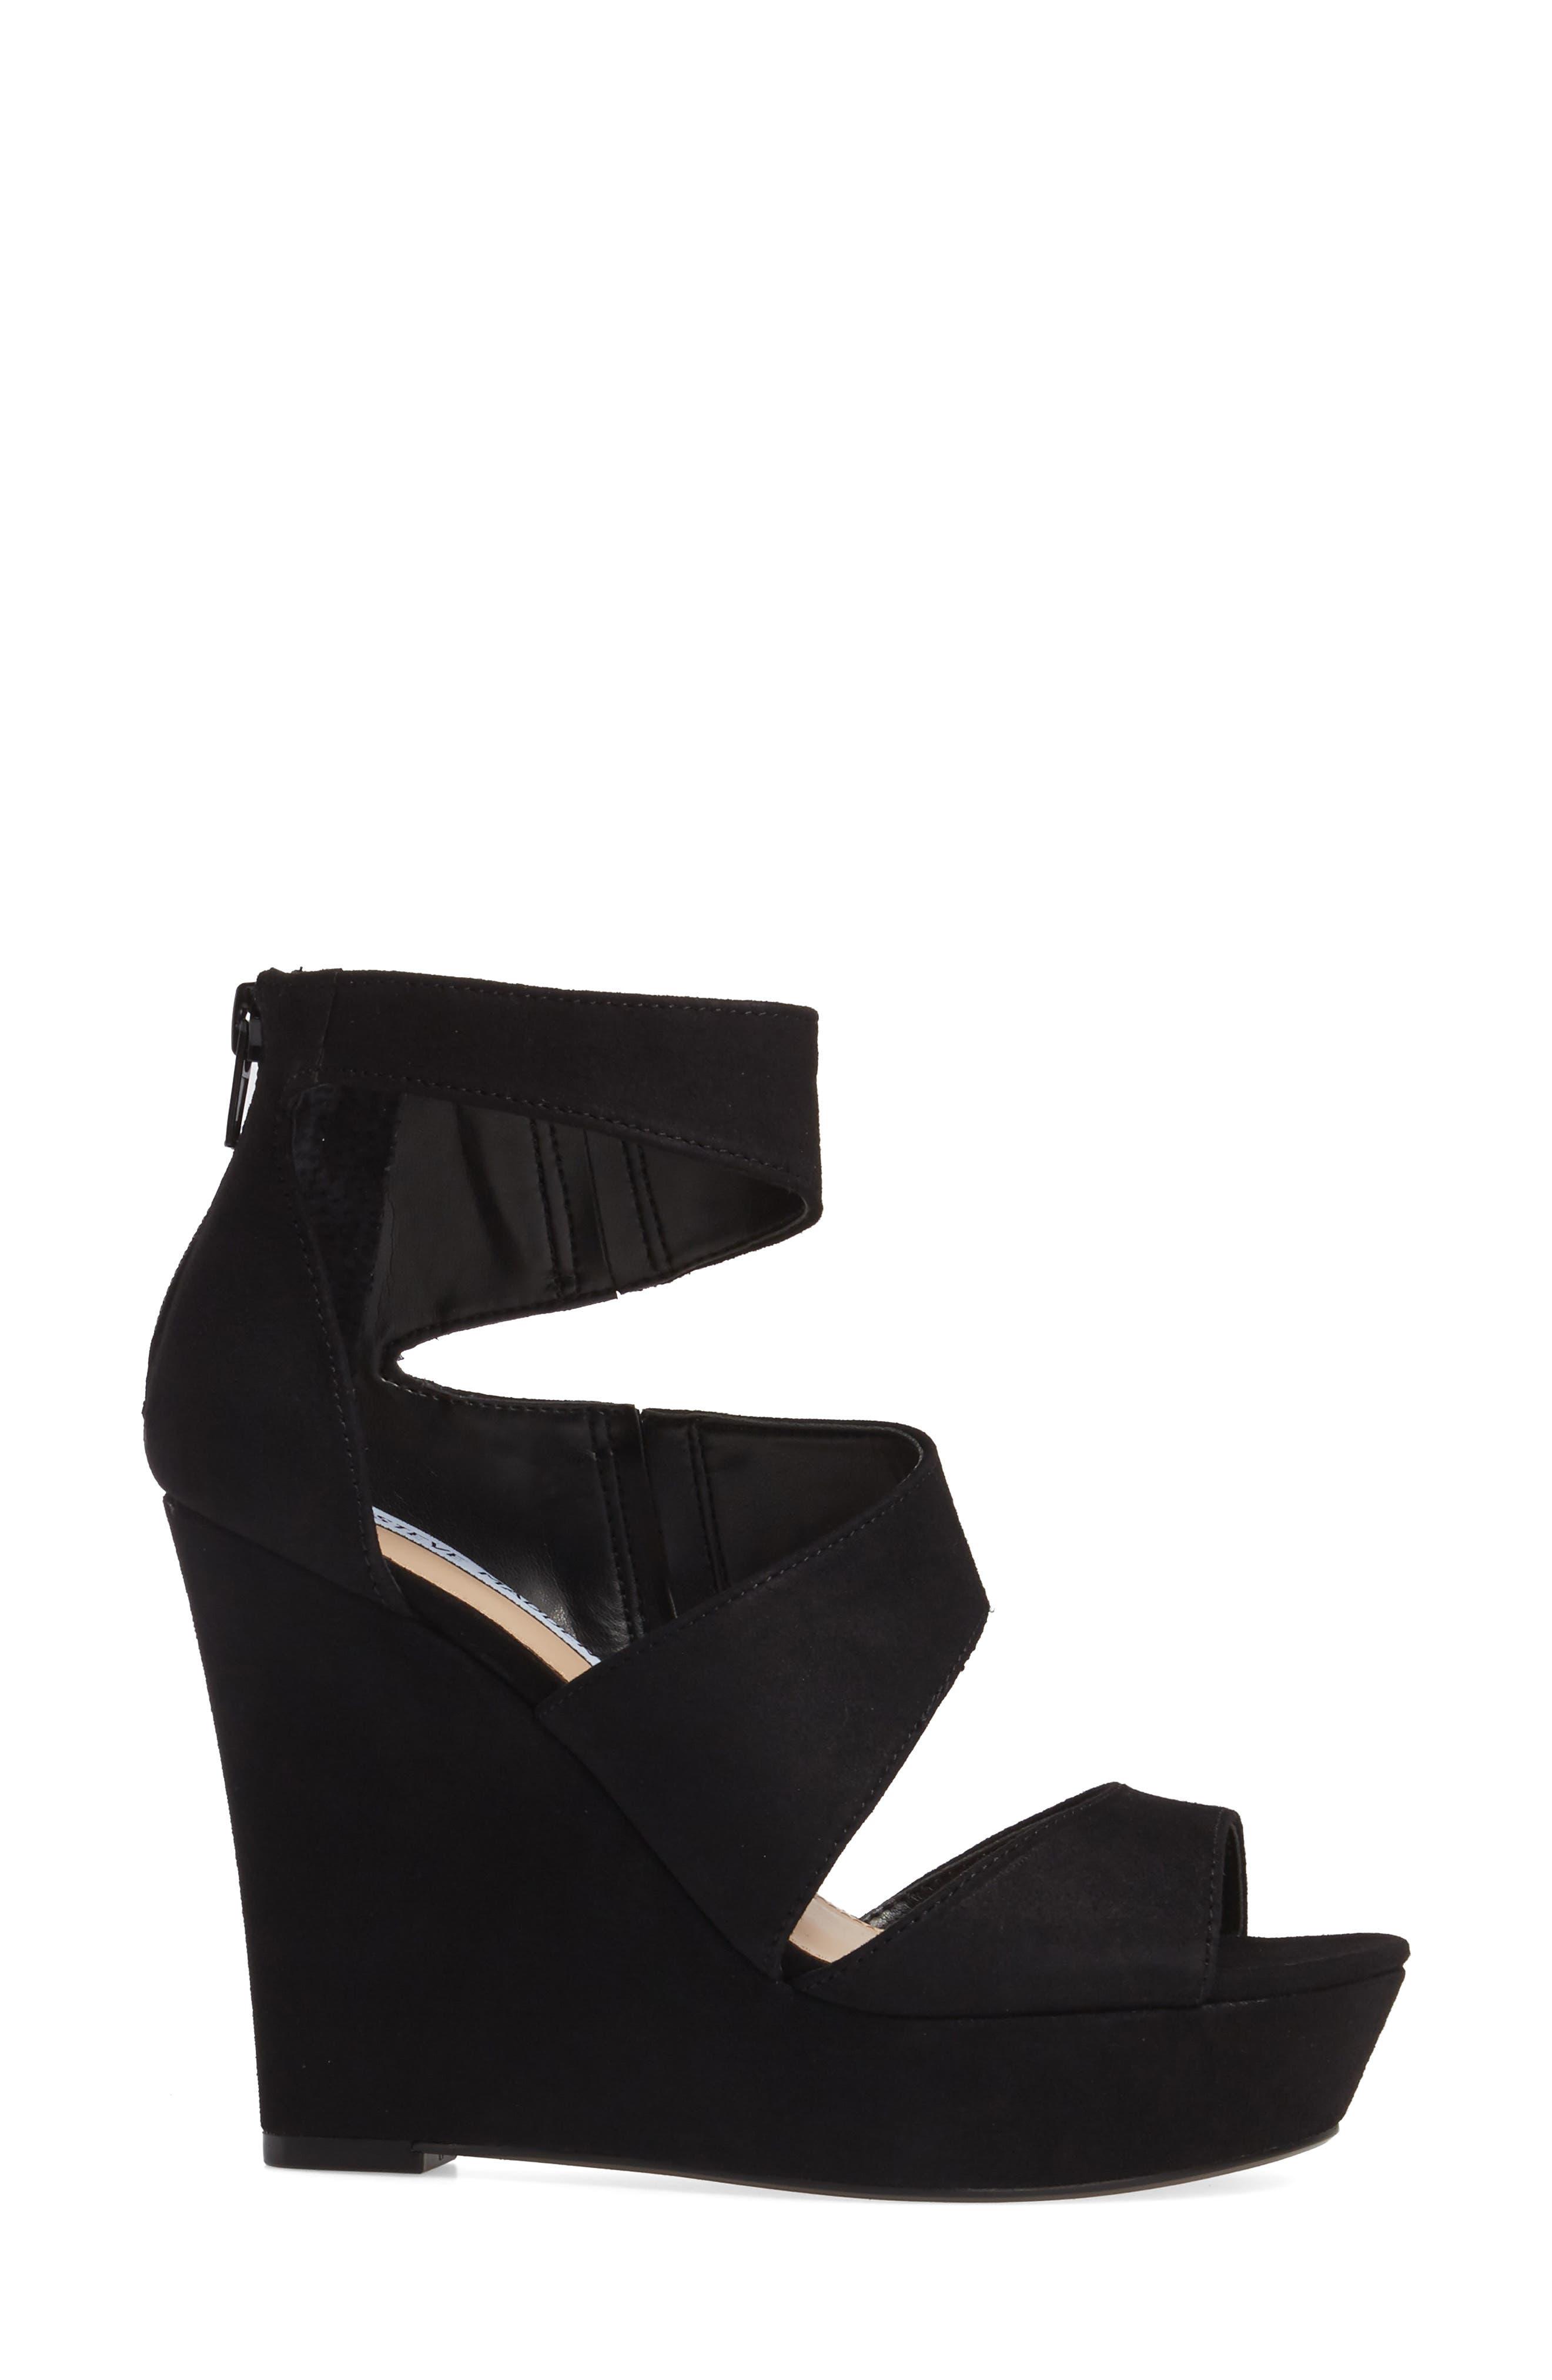 Essey Asymmetrical Platform Wedge Sandal,                             Alternate thumbnail 3, color,                             006